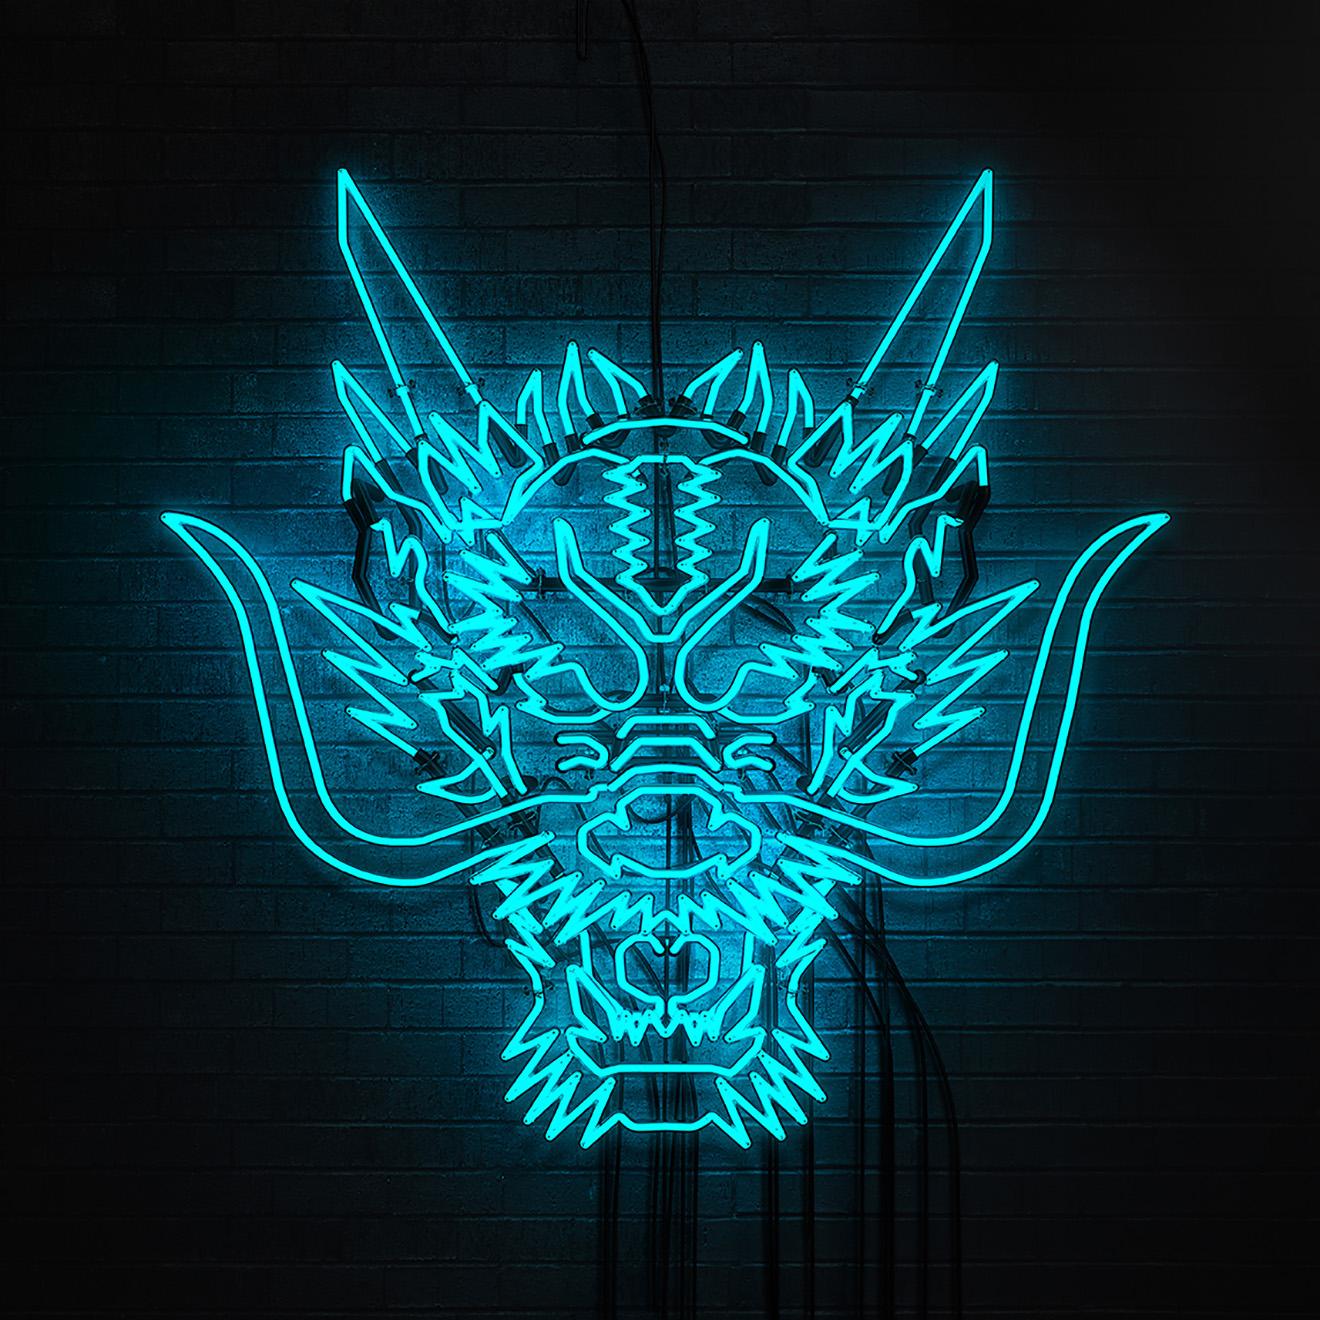 dragon 3d neon sign asics